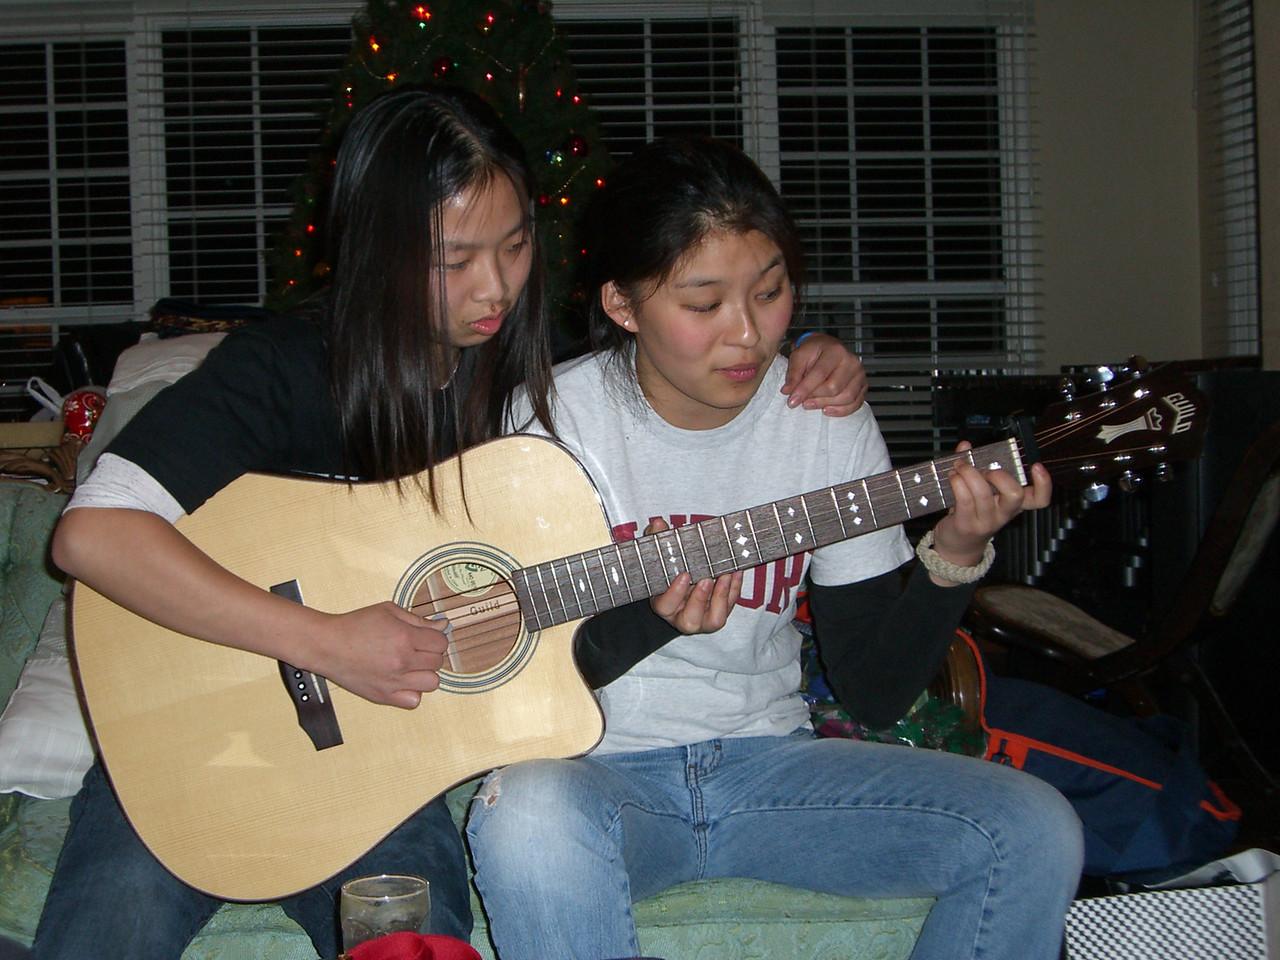 2005 12 18 Sun - Siamese twins Jenny Alyono & Jenn Kim, of different parents